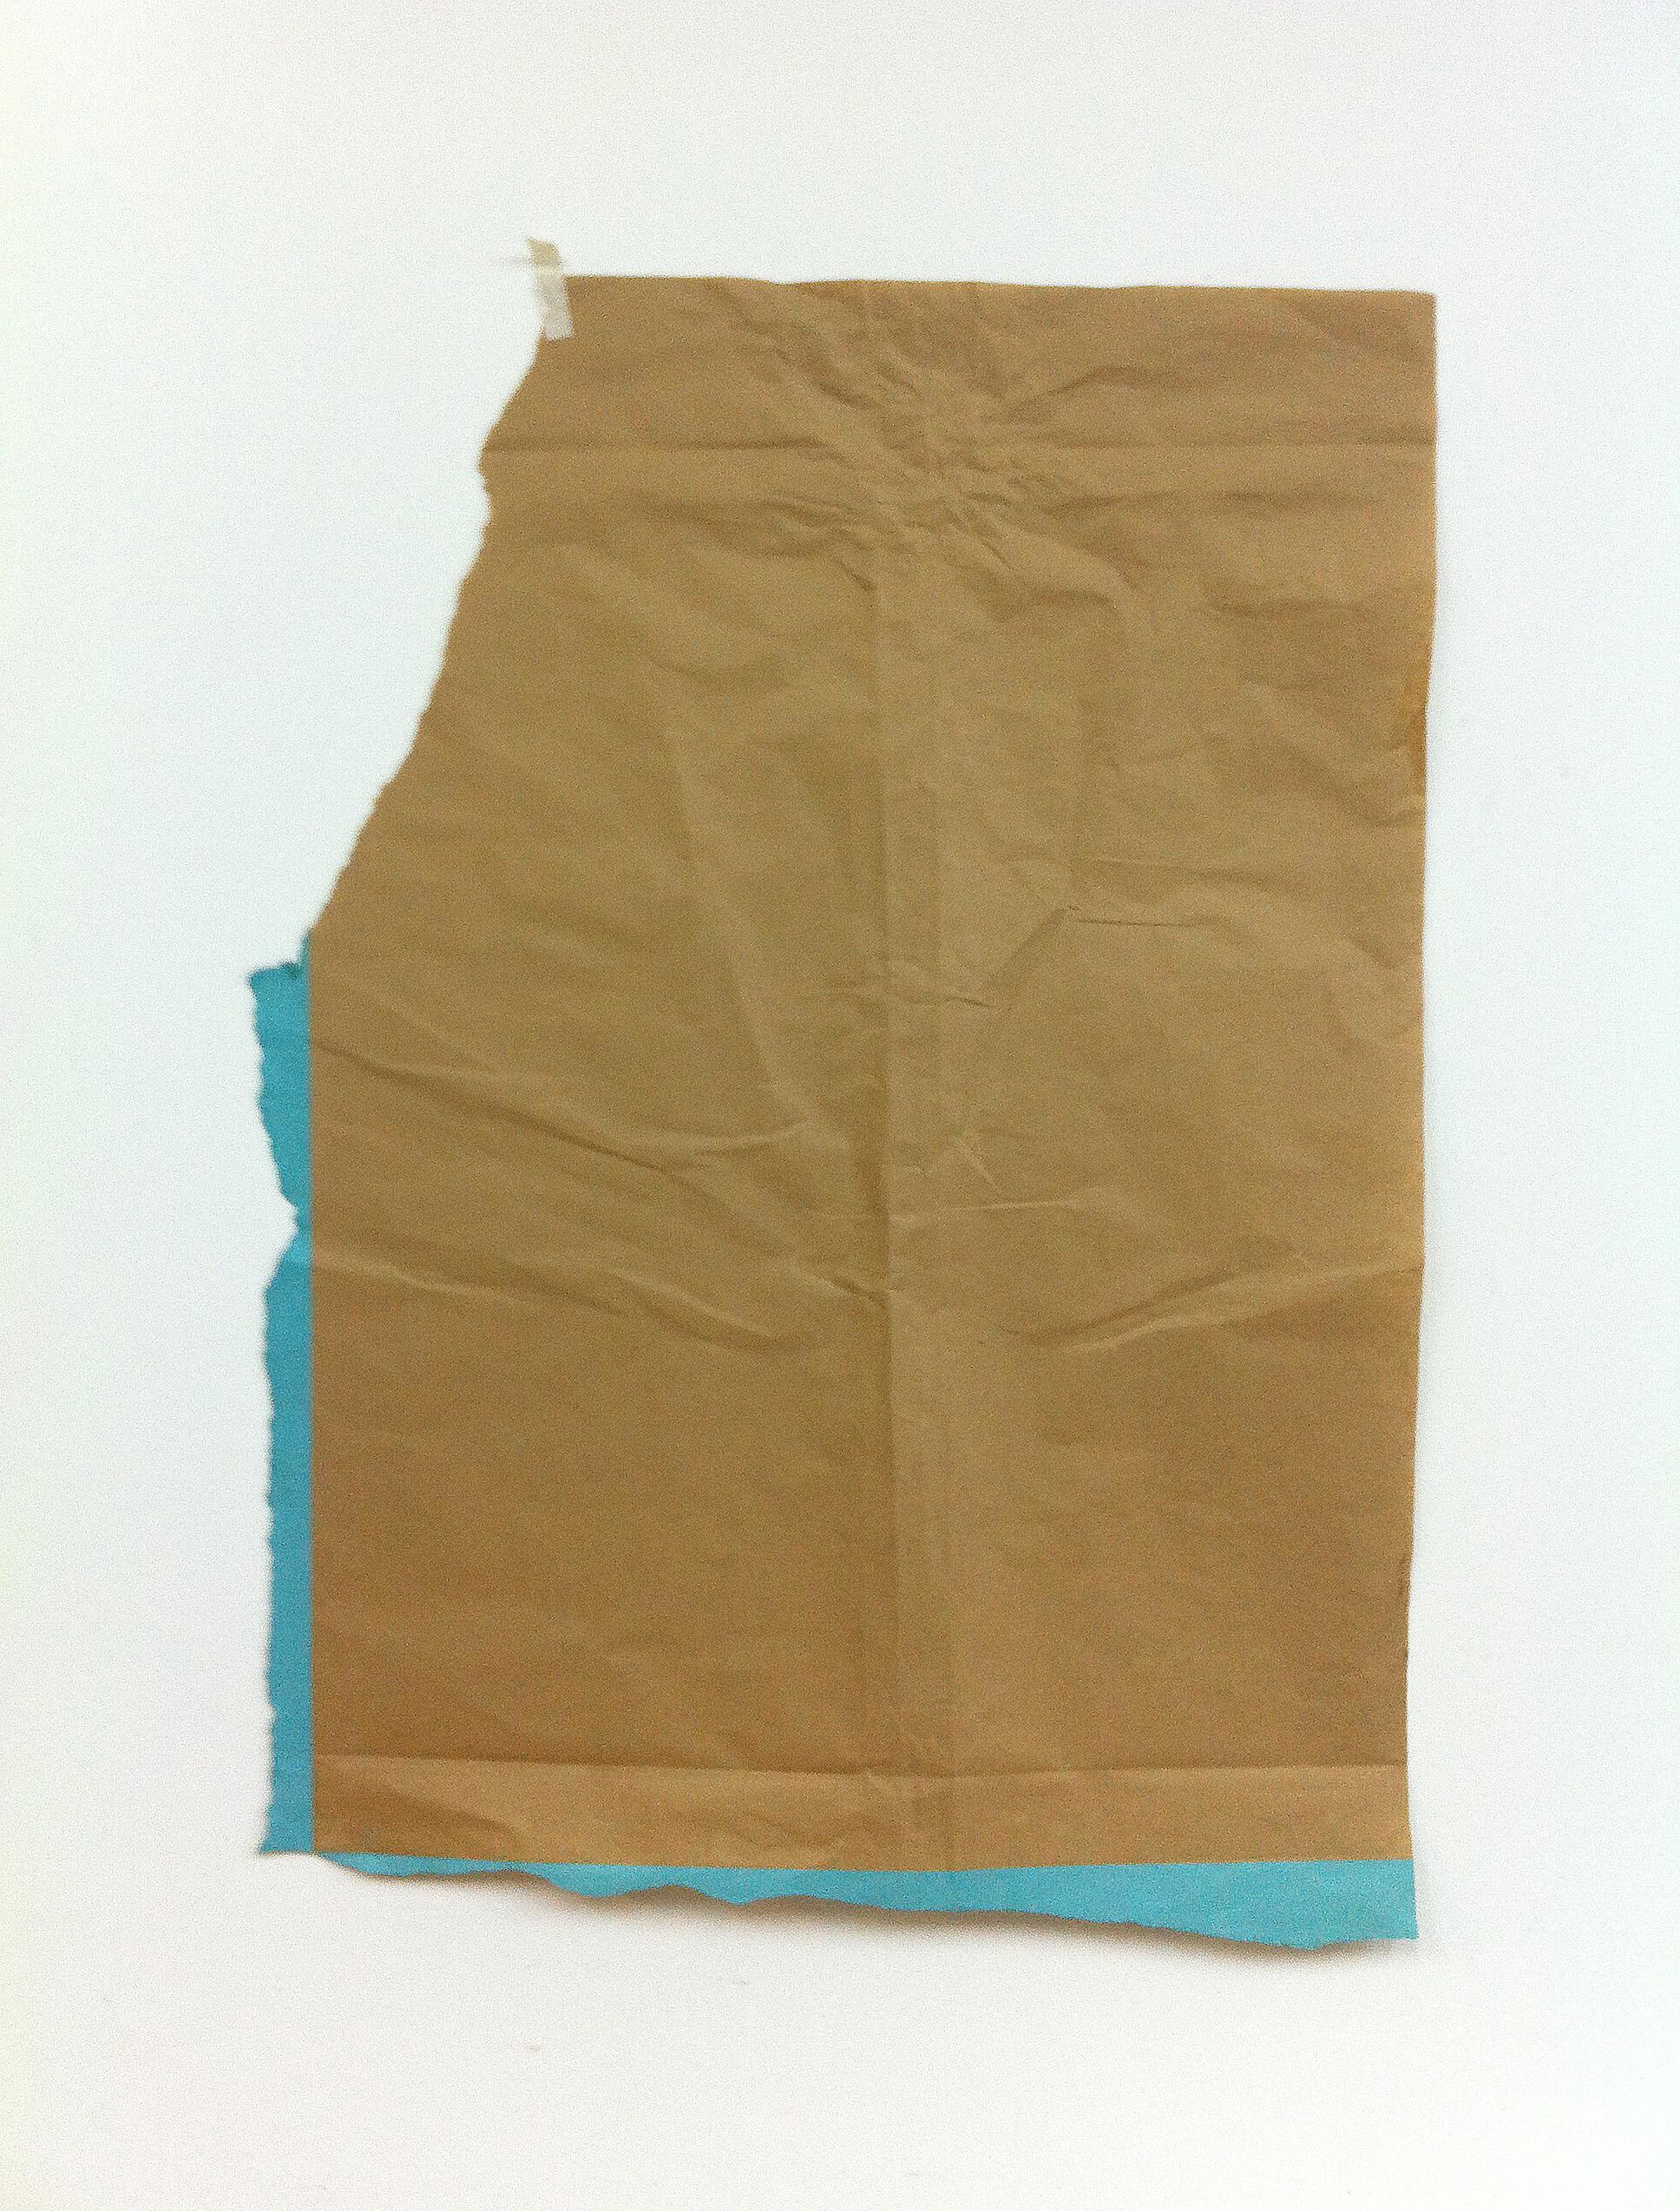 straight lines 2, 74 x 53 cms, óleo sobre papel